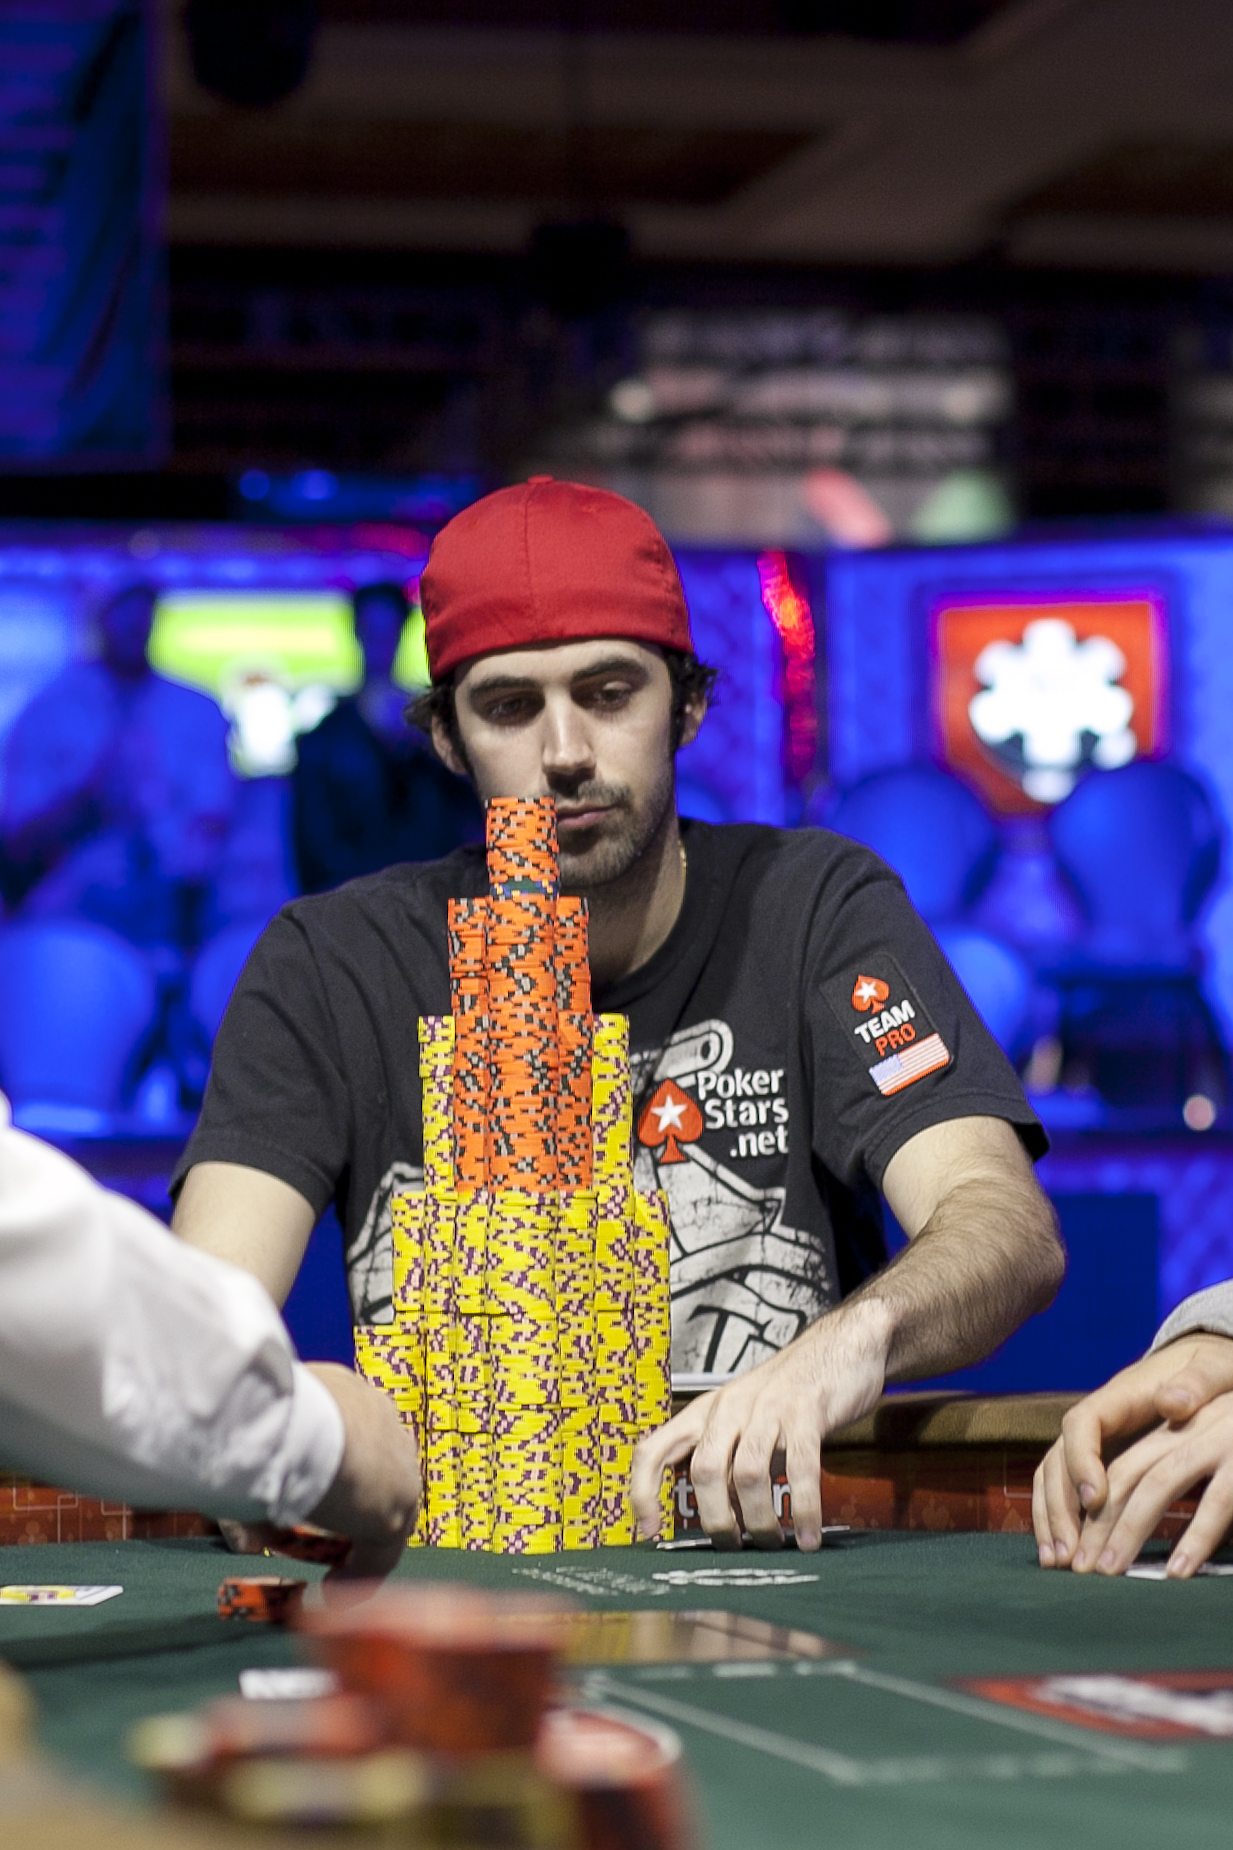 337 poker pro